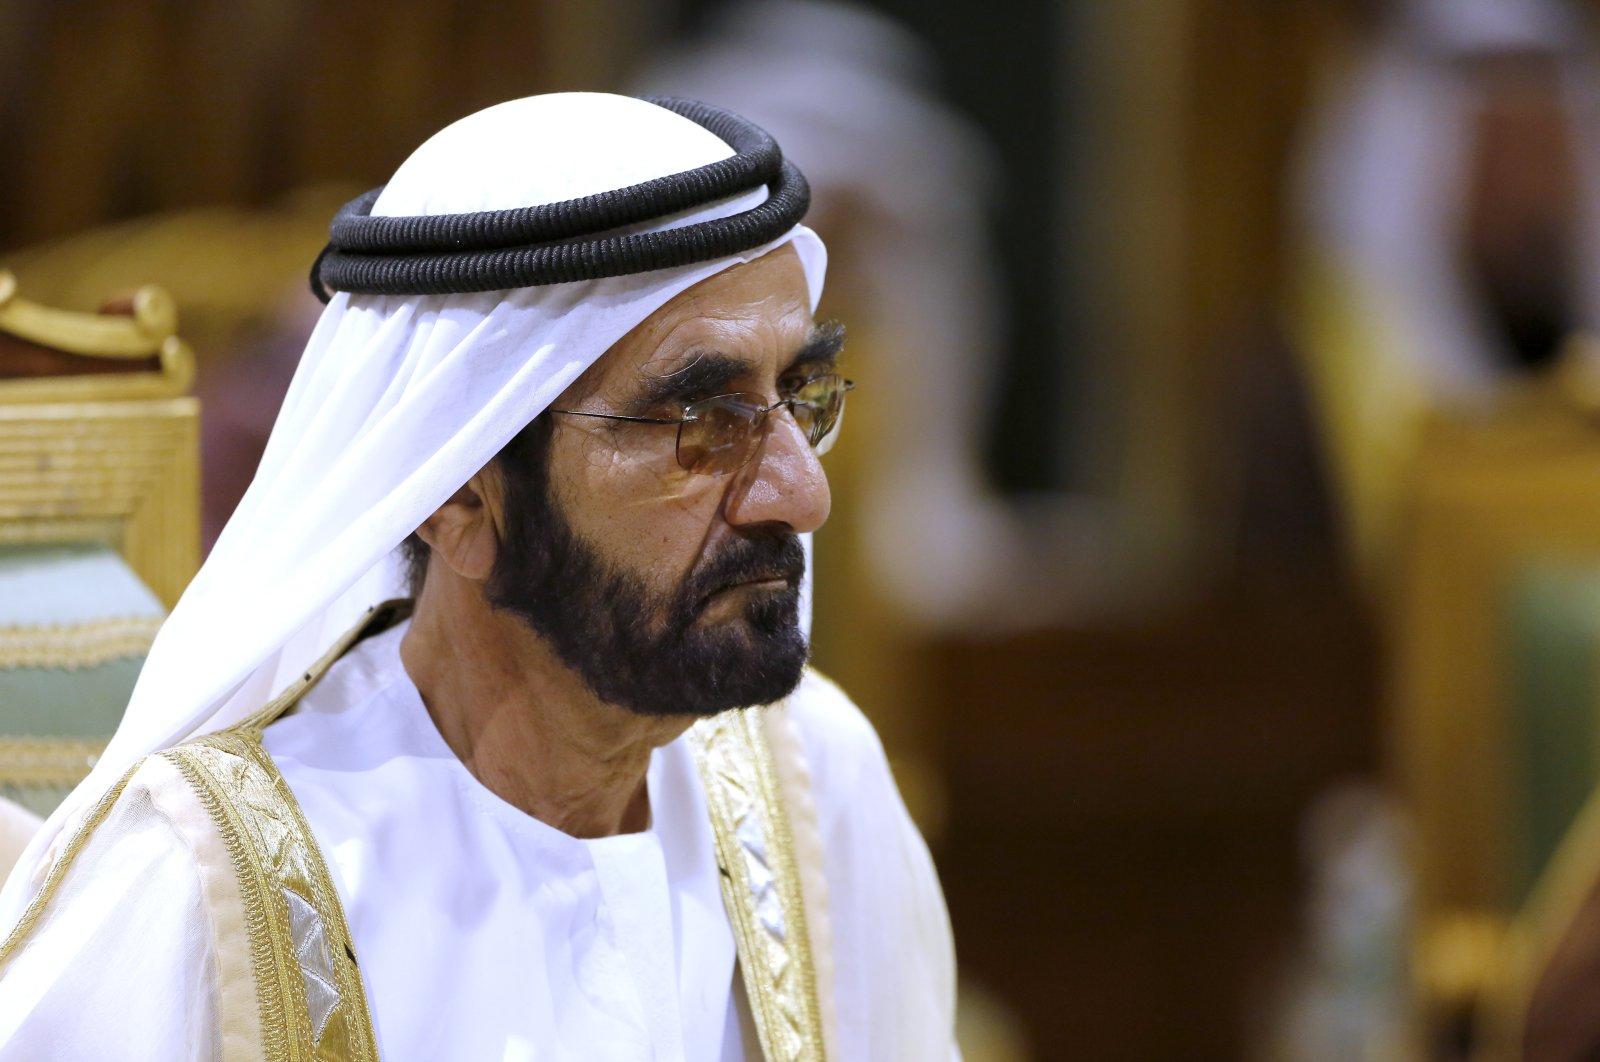 Prime Minister of the United Arab Emirates (UAE) Sheikh Sheikh Mohammed bin Rashid Al Maktoum attends the 40th Gulf Cooperation Council Summit in Riyadh, Saudi Arabia, Dec. 10, 2019. (AP Photo)